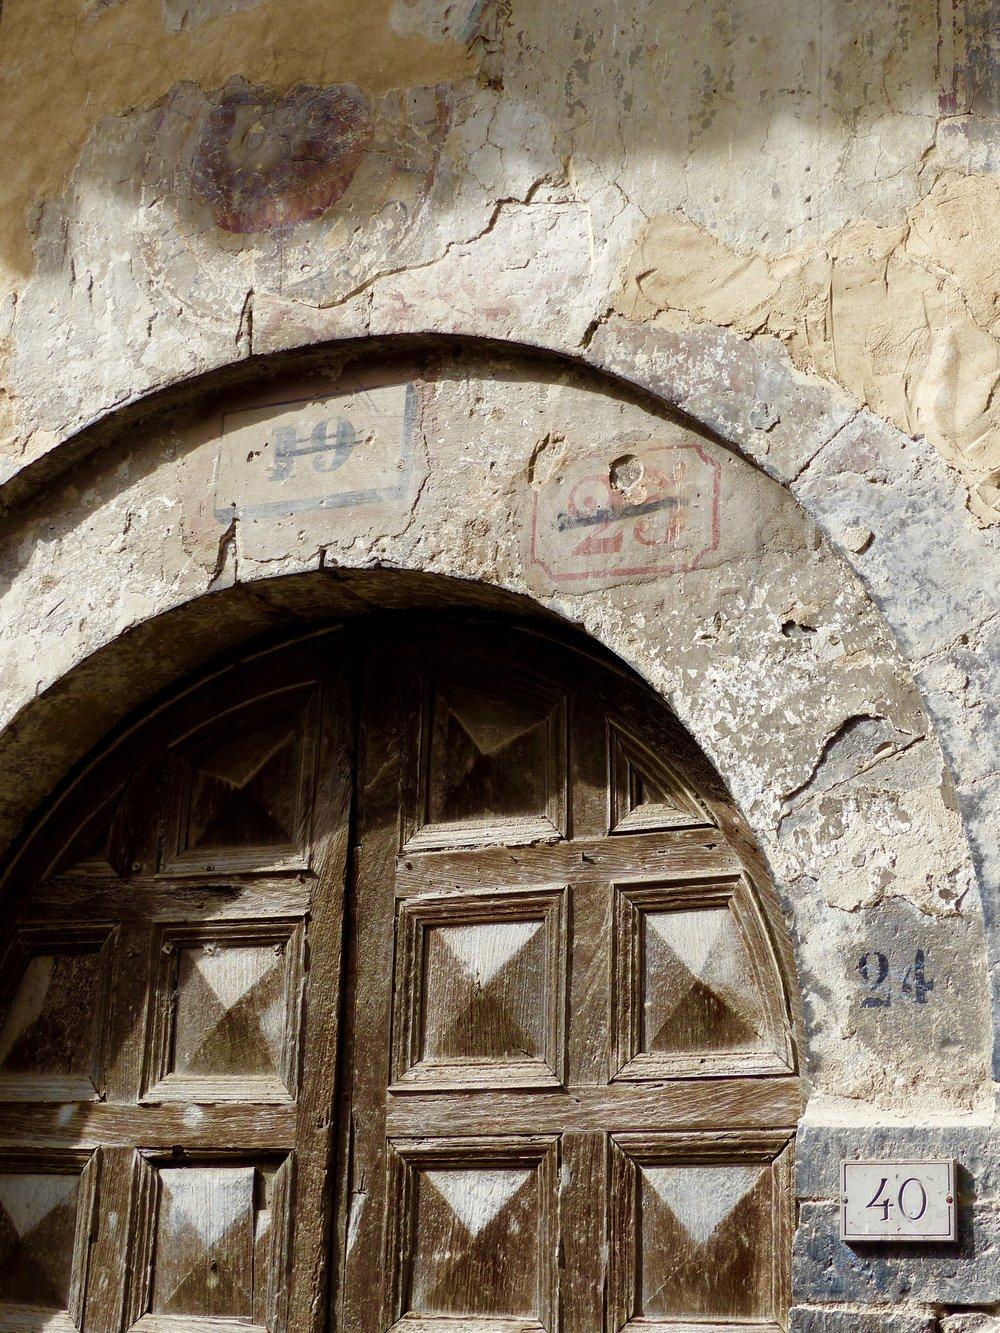 spello_doorconfusion.jpg